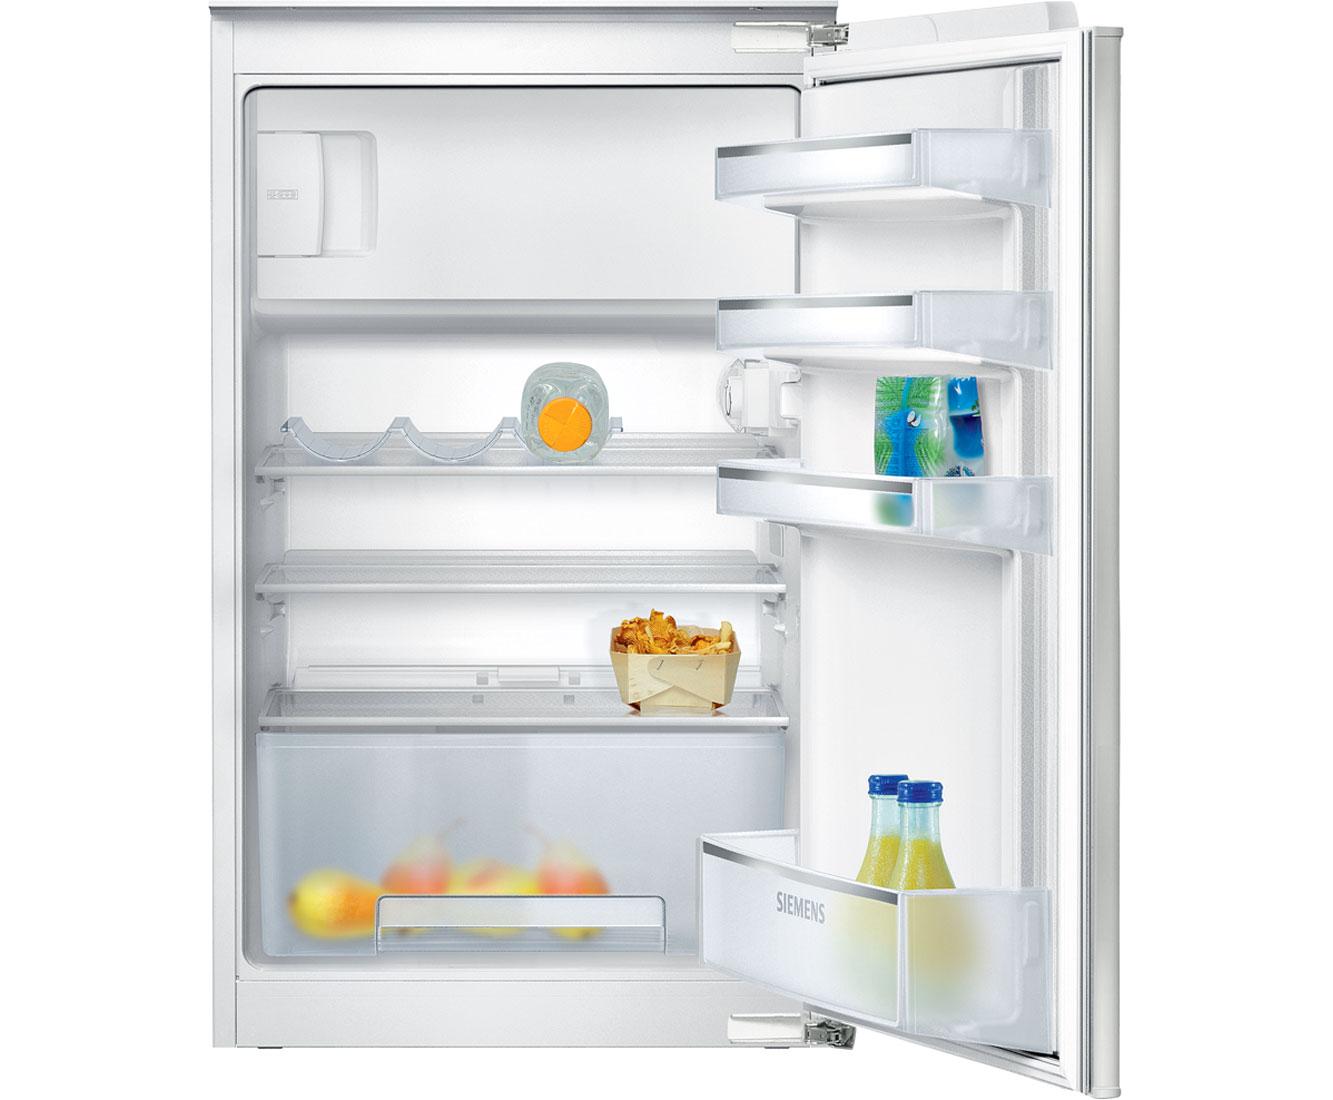 ... Siemens KI18LV52 Einbau Kühlschrank Mit Gefrierfach   A+   KI18LV52_WH    1 ...